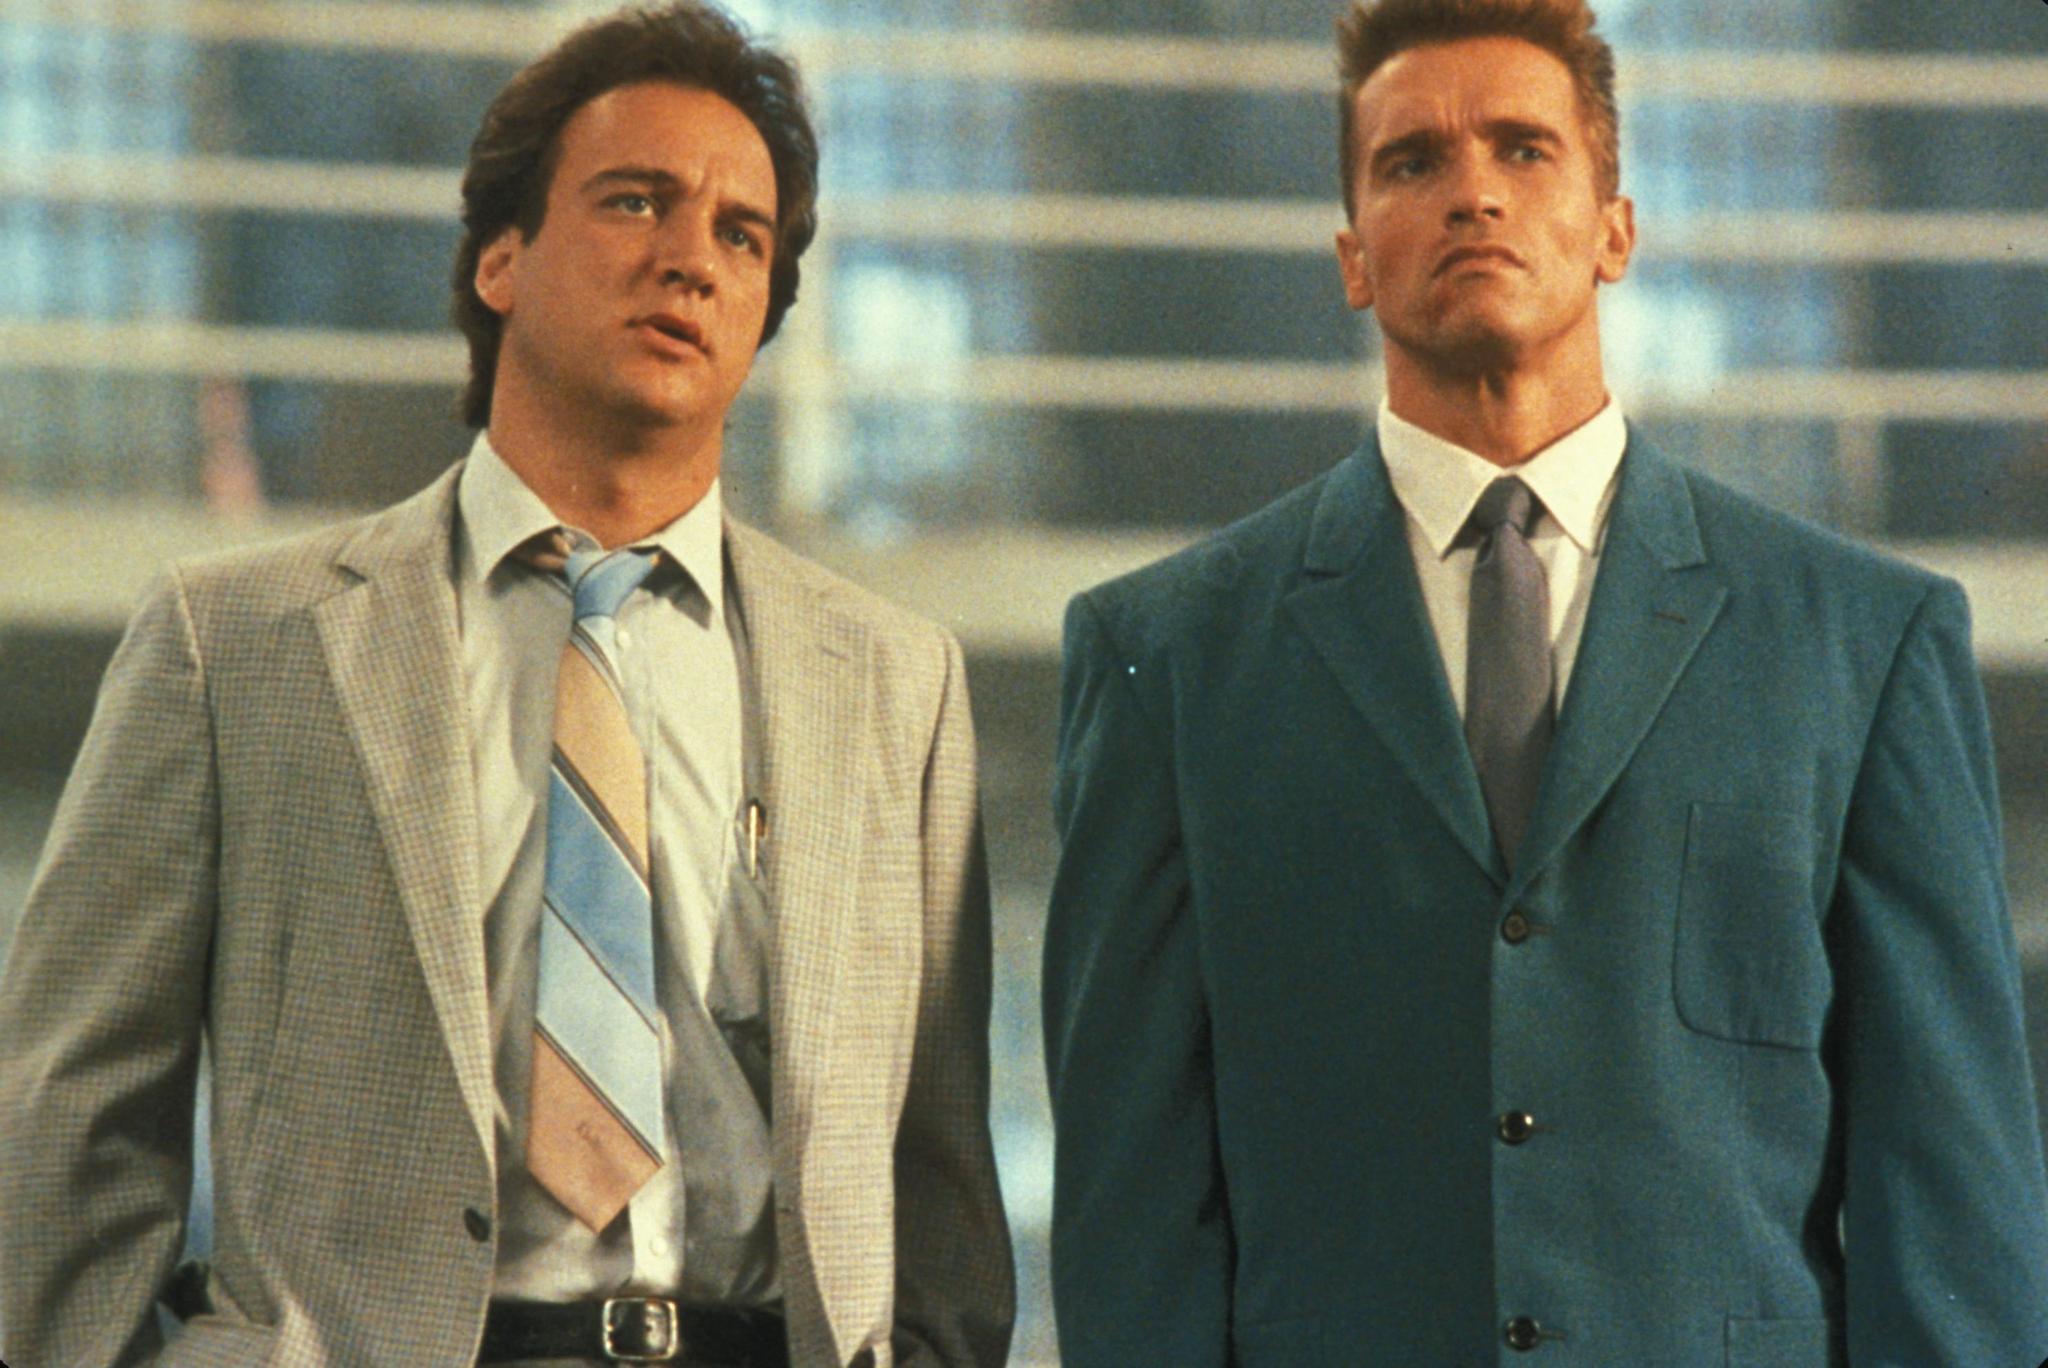 Arnold Schwarzenegger and Jim Belushi in Red Heat (1988)